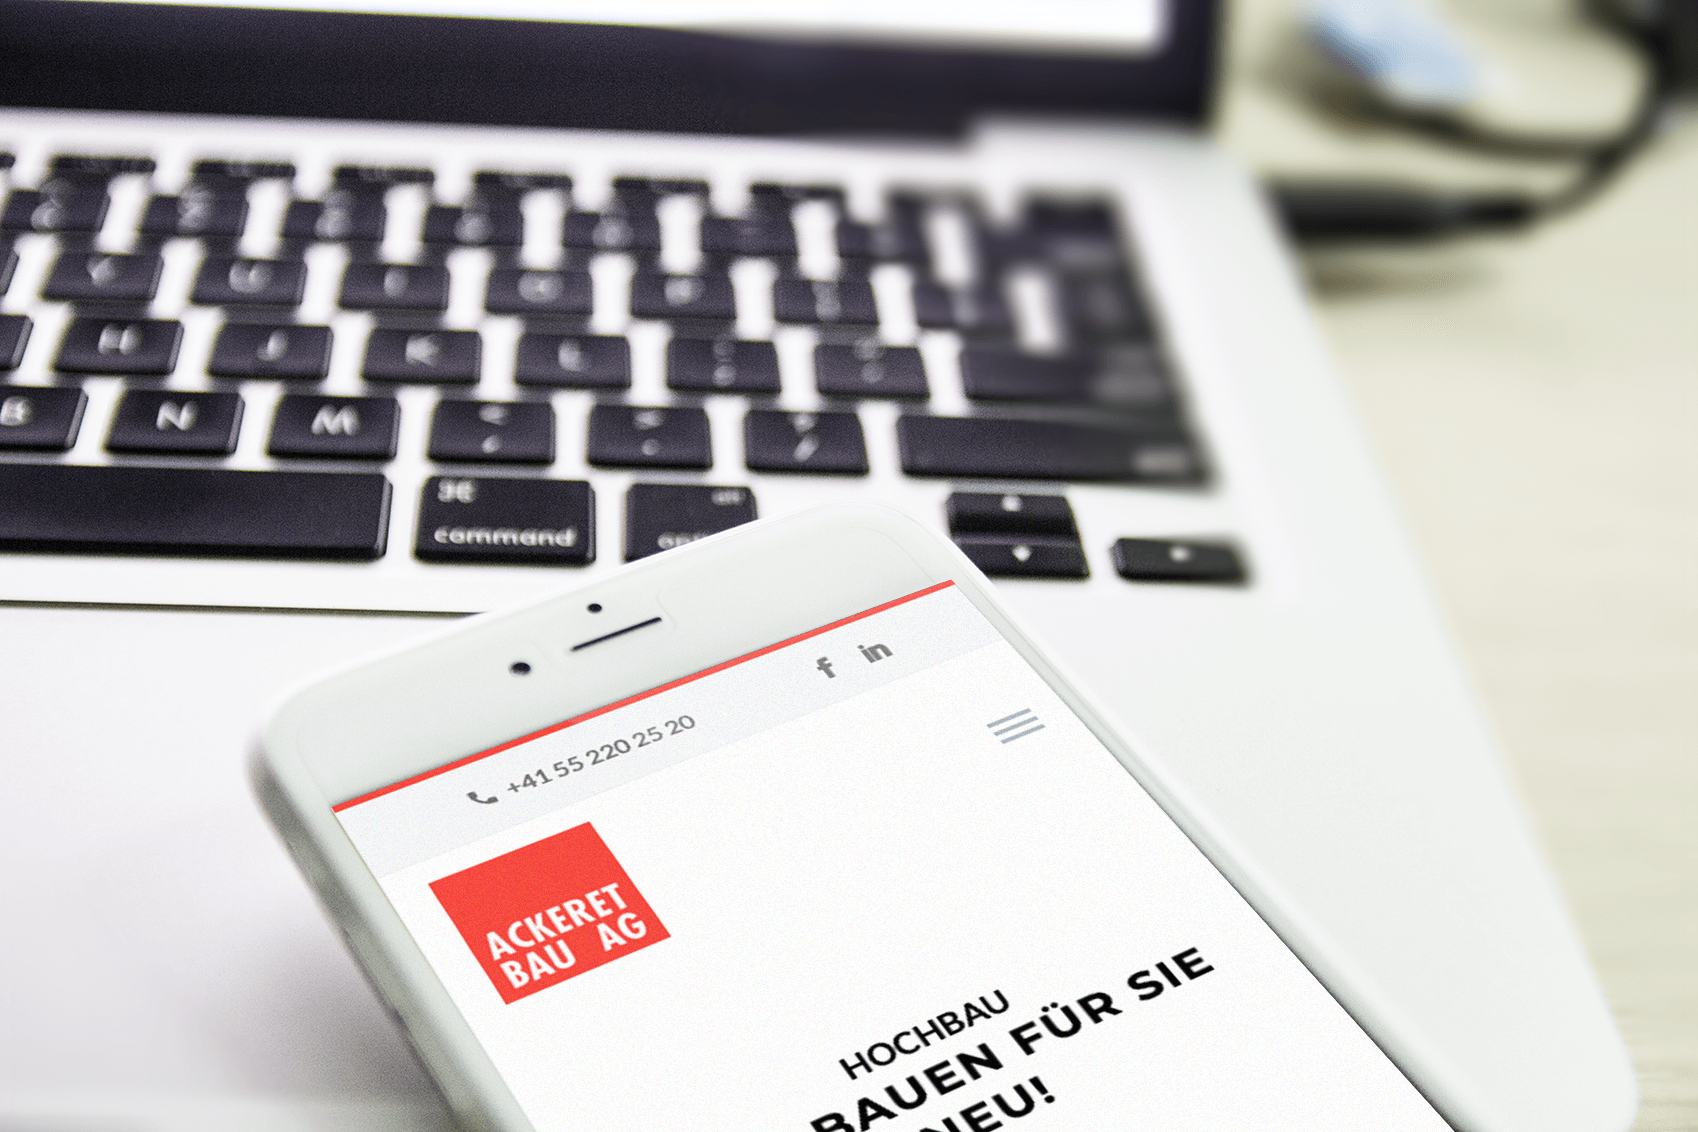 Ackeret Bau AG Webseite / Webdesign